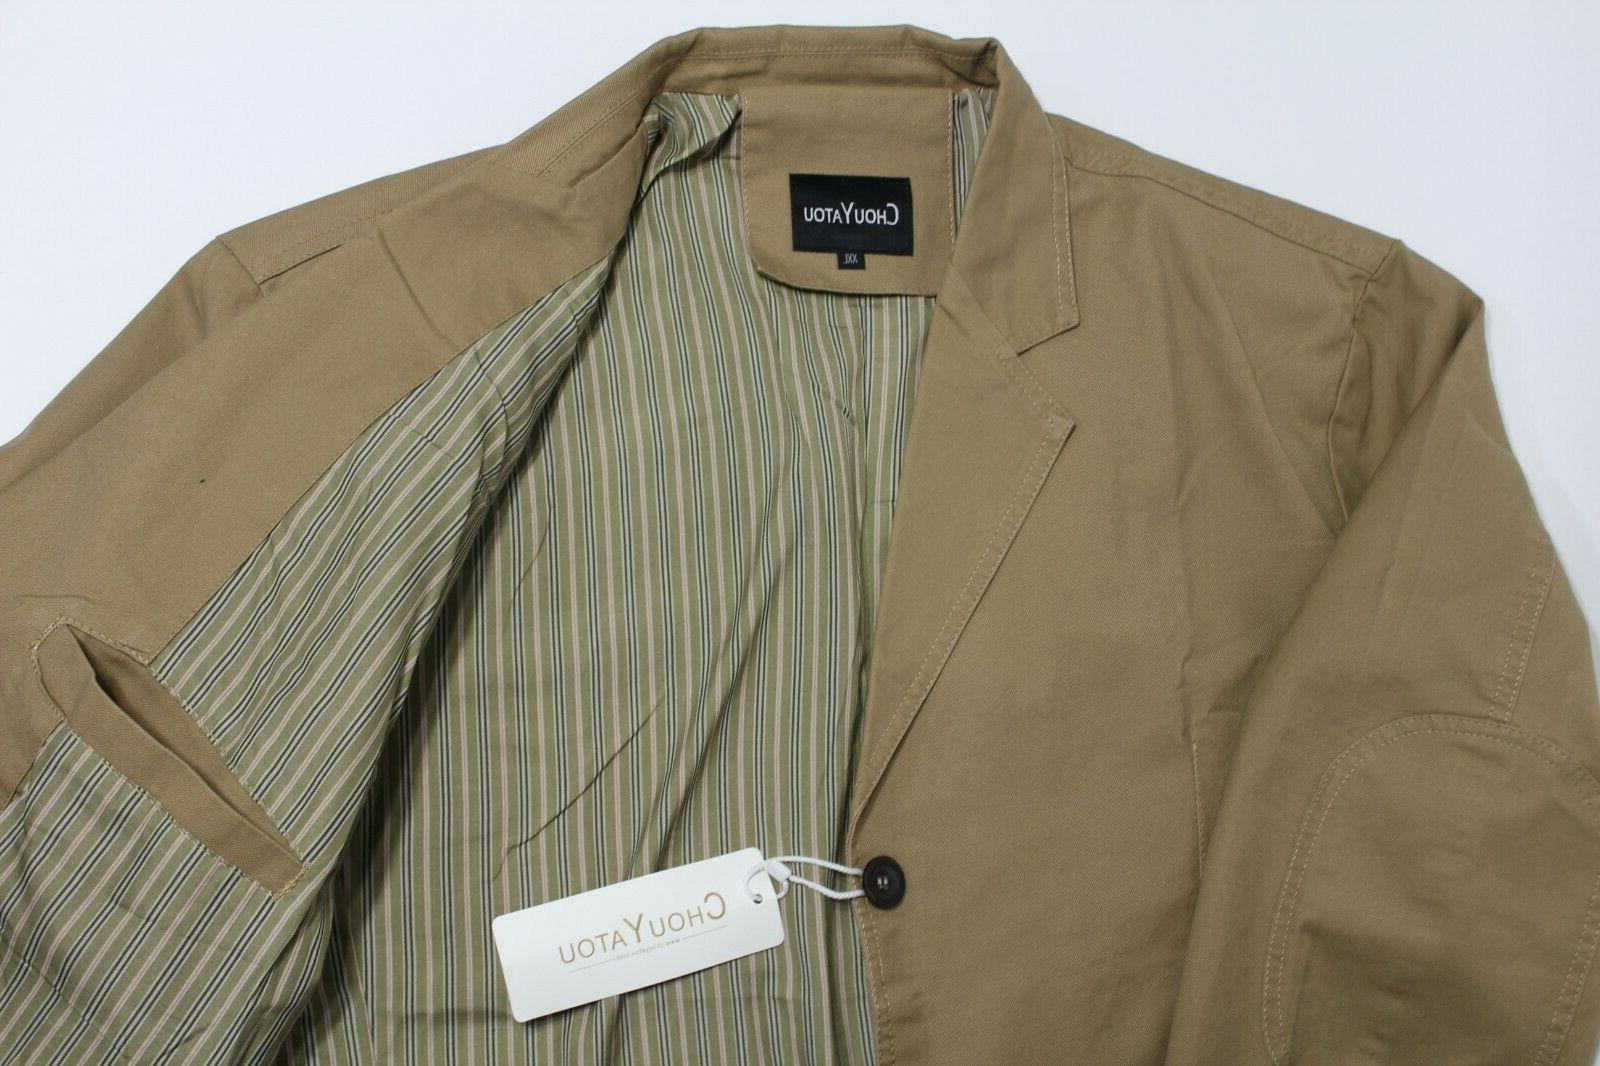 ChouYatou Cotton Twill Jacket, Men Size Khaki, 3 Button